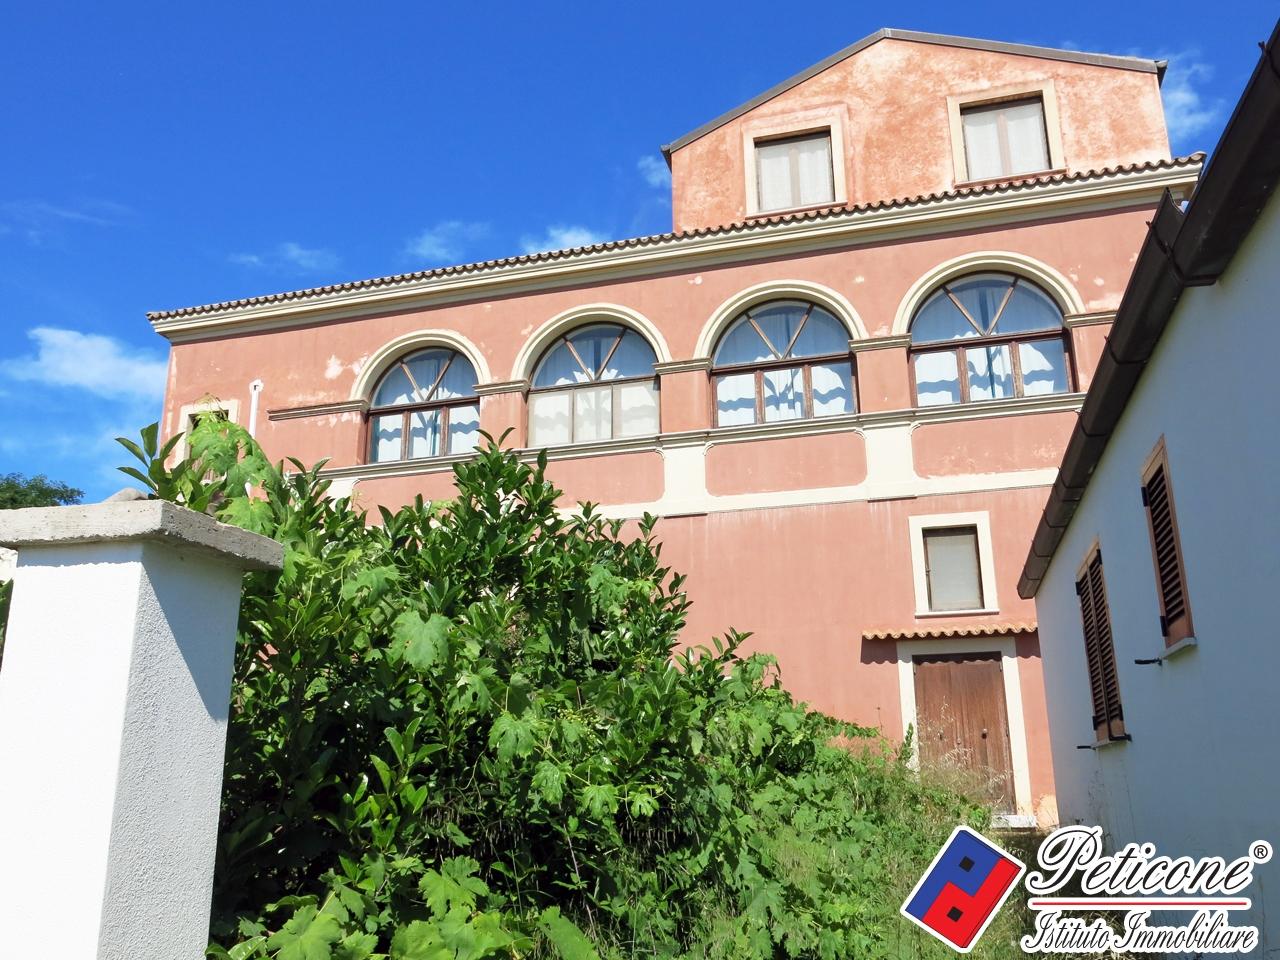 Villa in Vendita a Gaeta: 5 locali, 250 mq - Foto 1